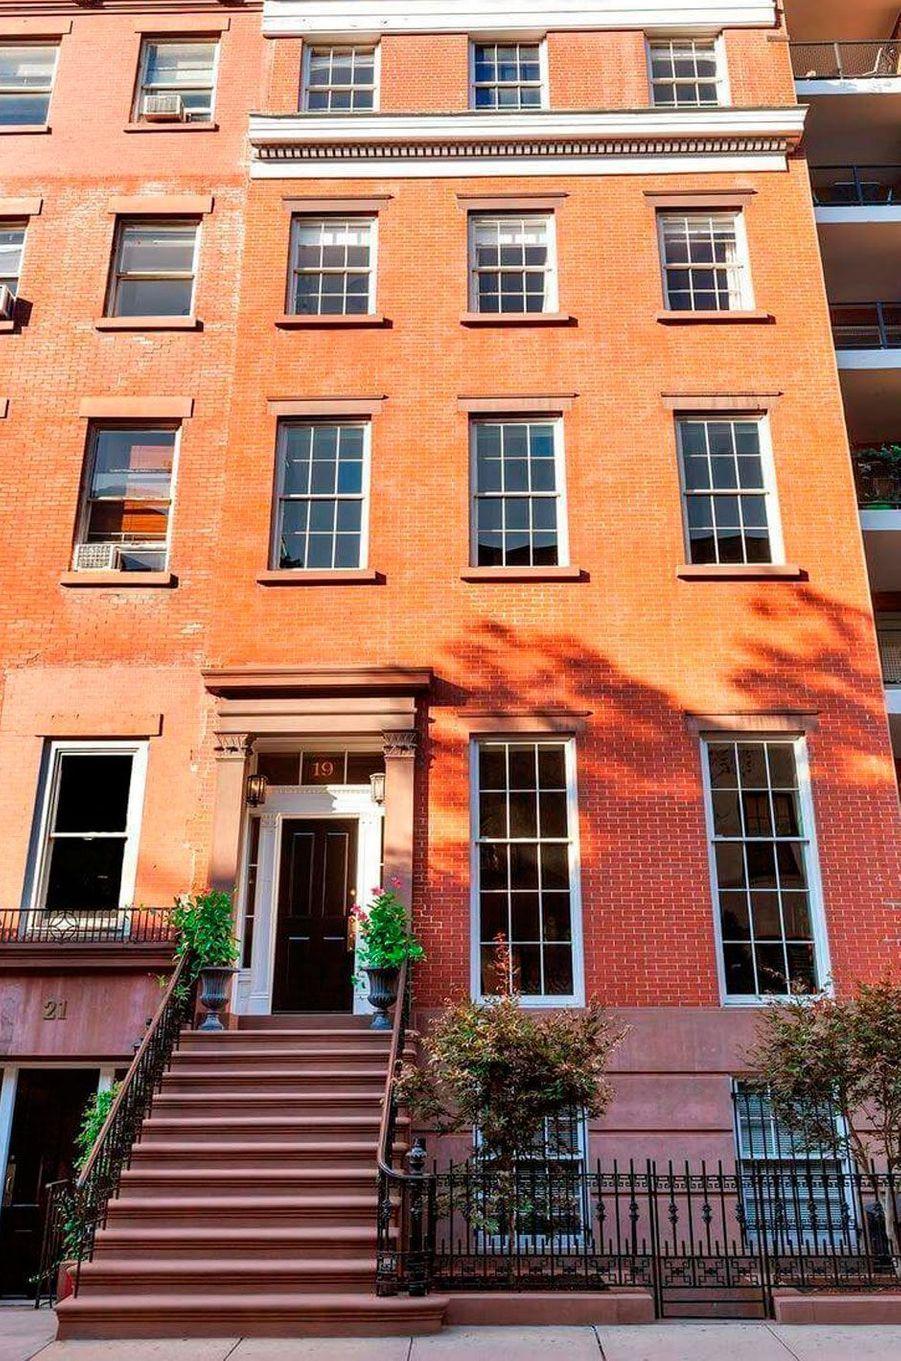 La façade de la maison de Meryl Streep à New York